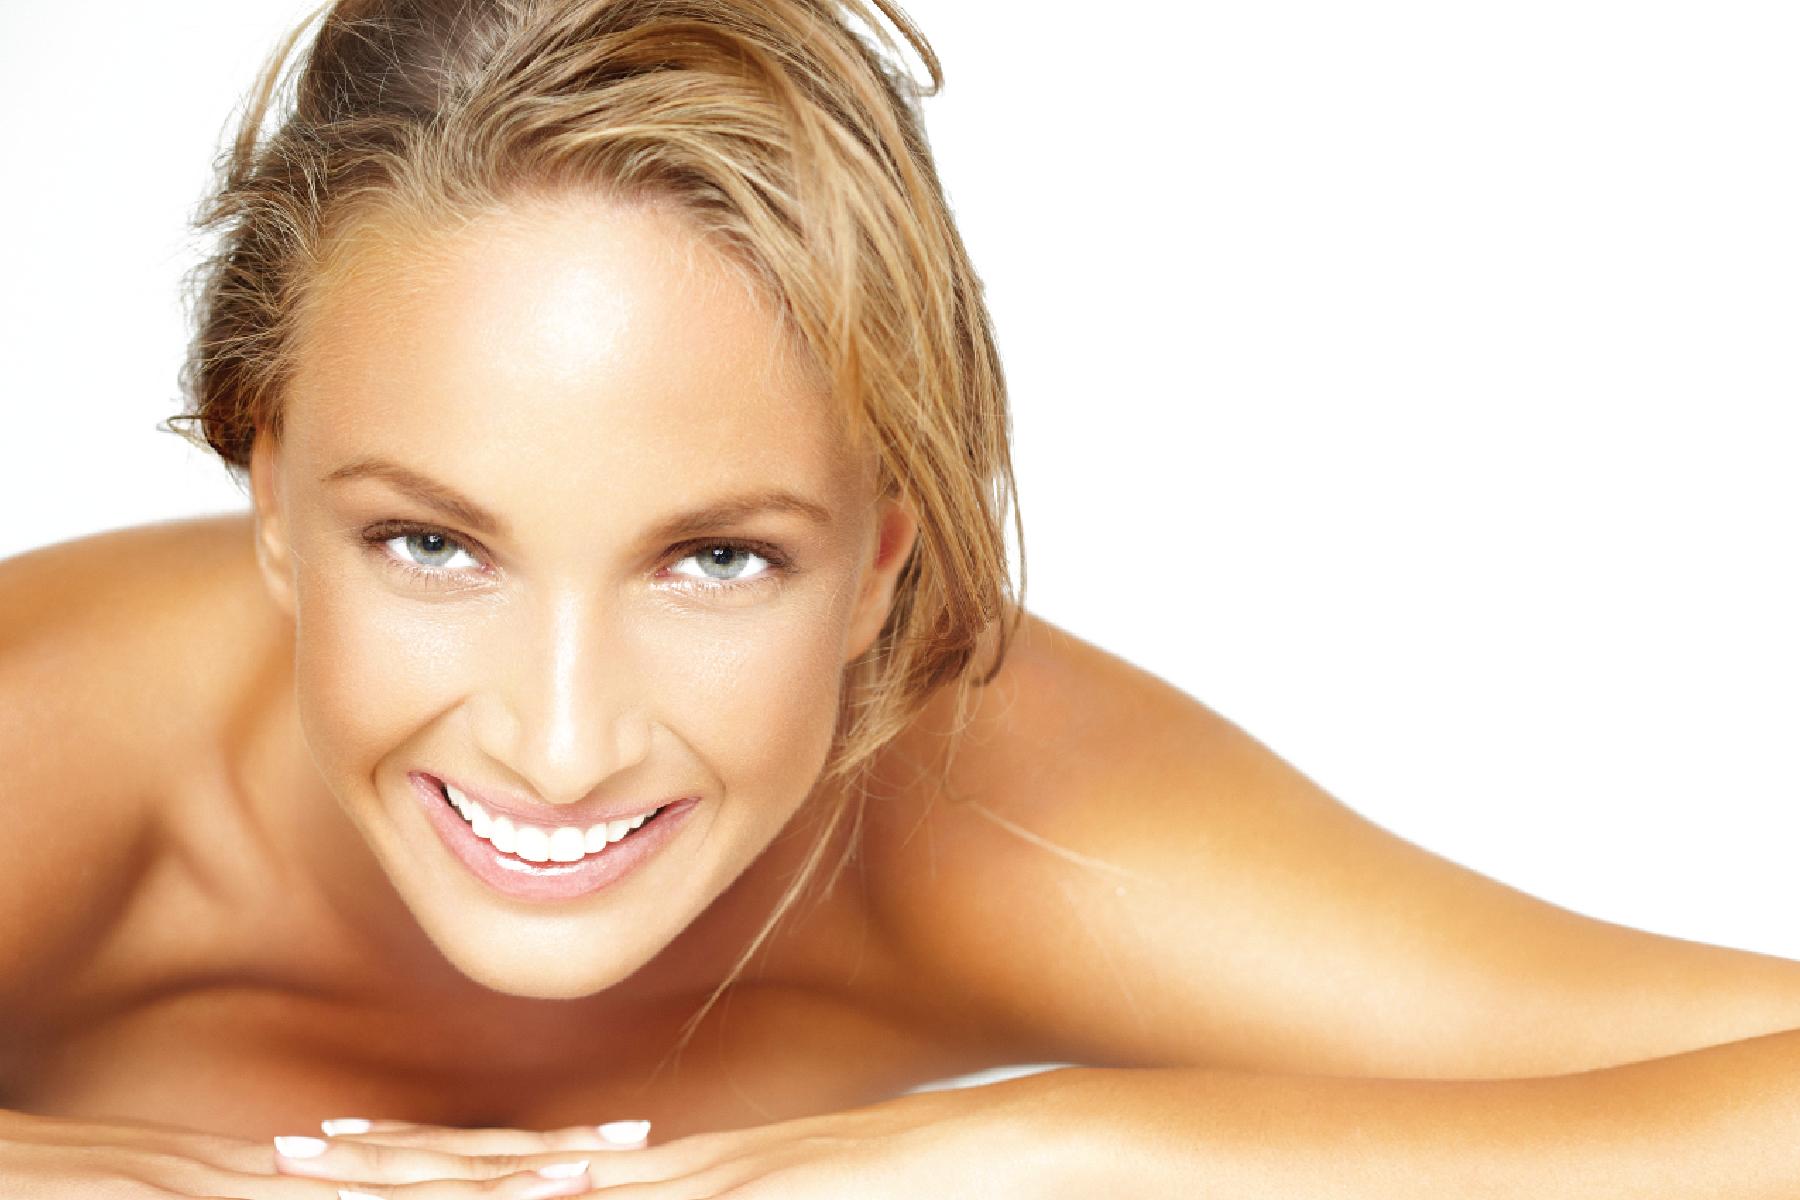 happy tanned blonde woman.jpg